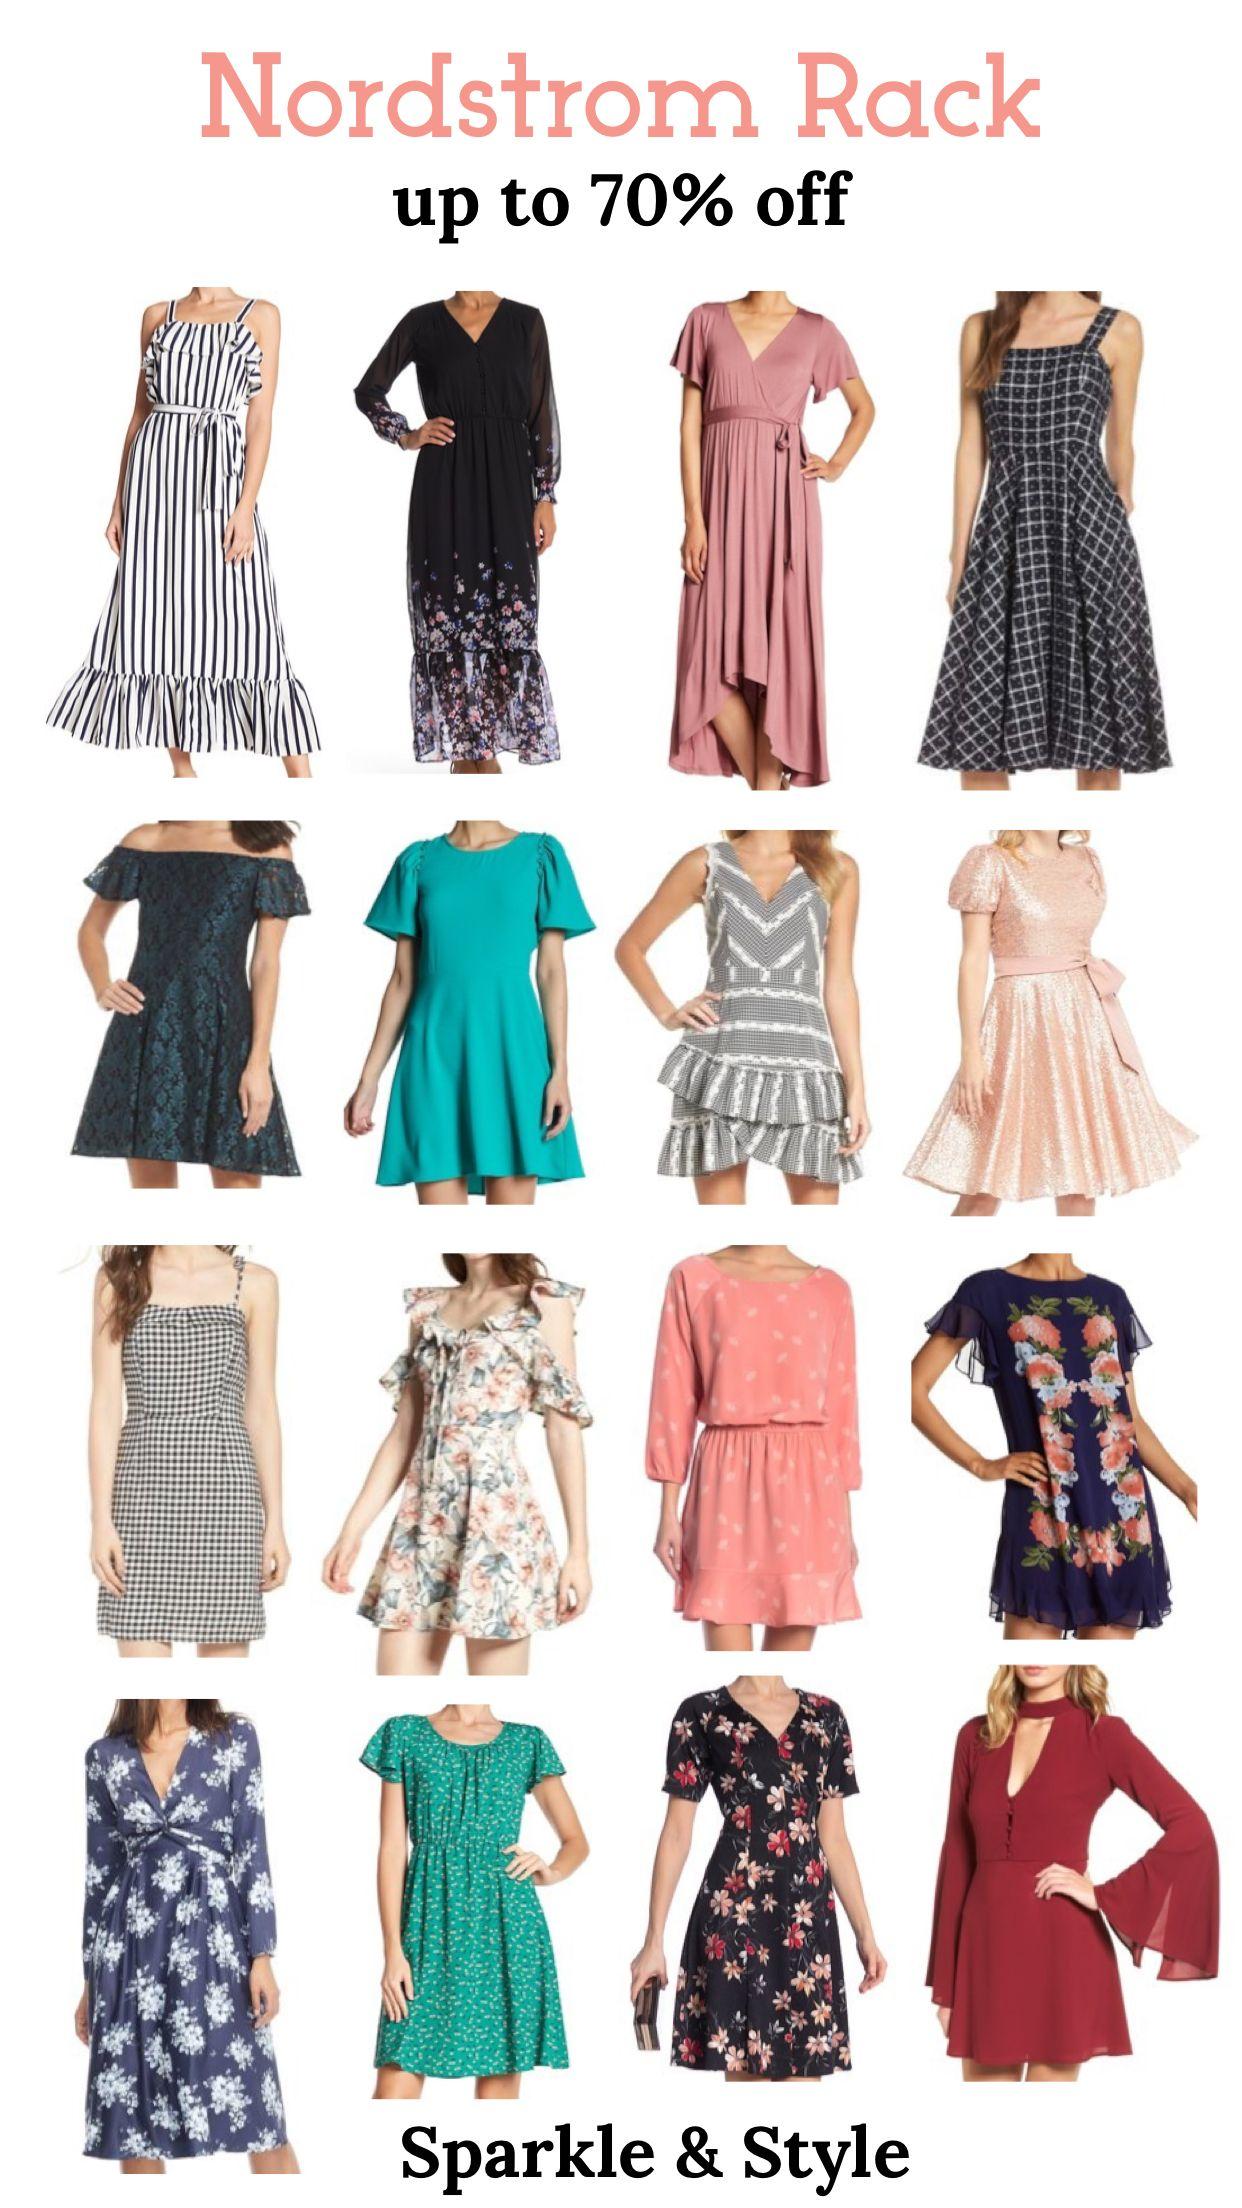 Nordstrom Rack Sale Finds - Sparkle & Style  Fashion blogger